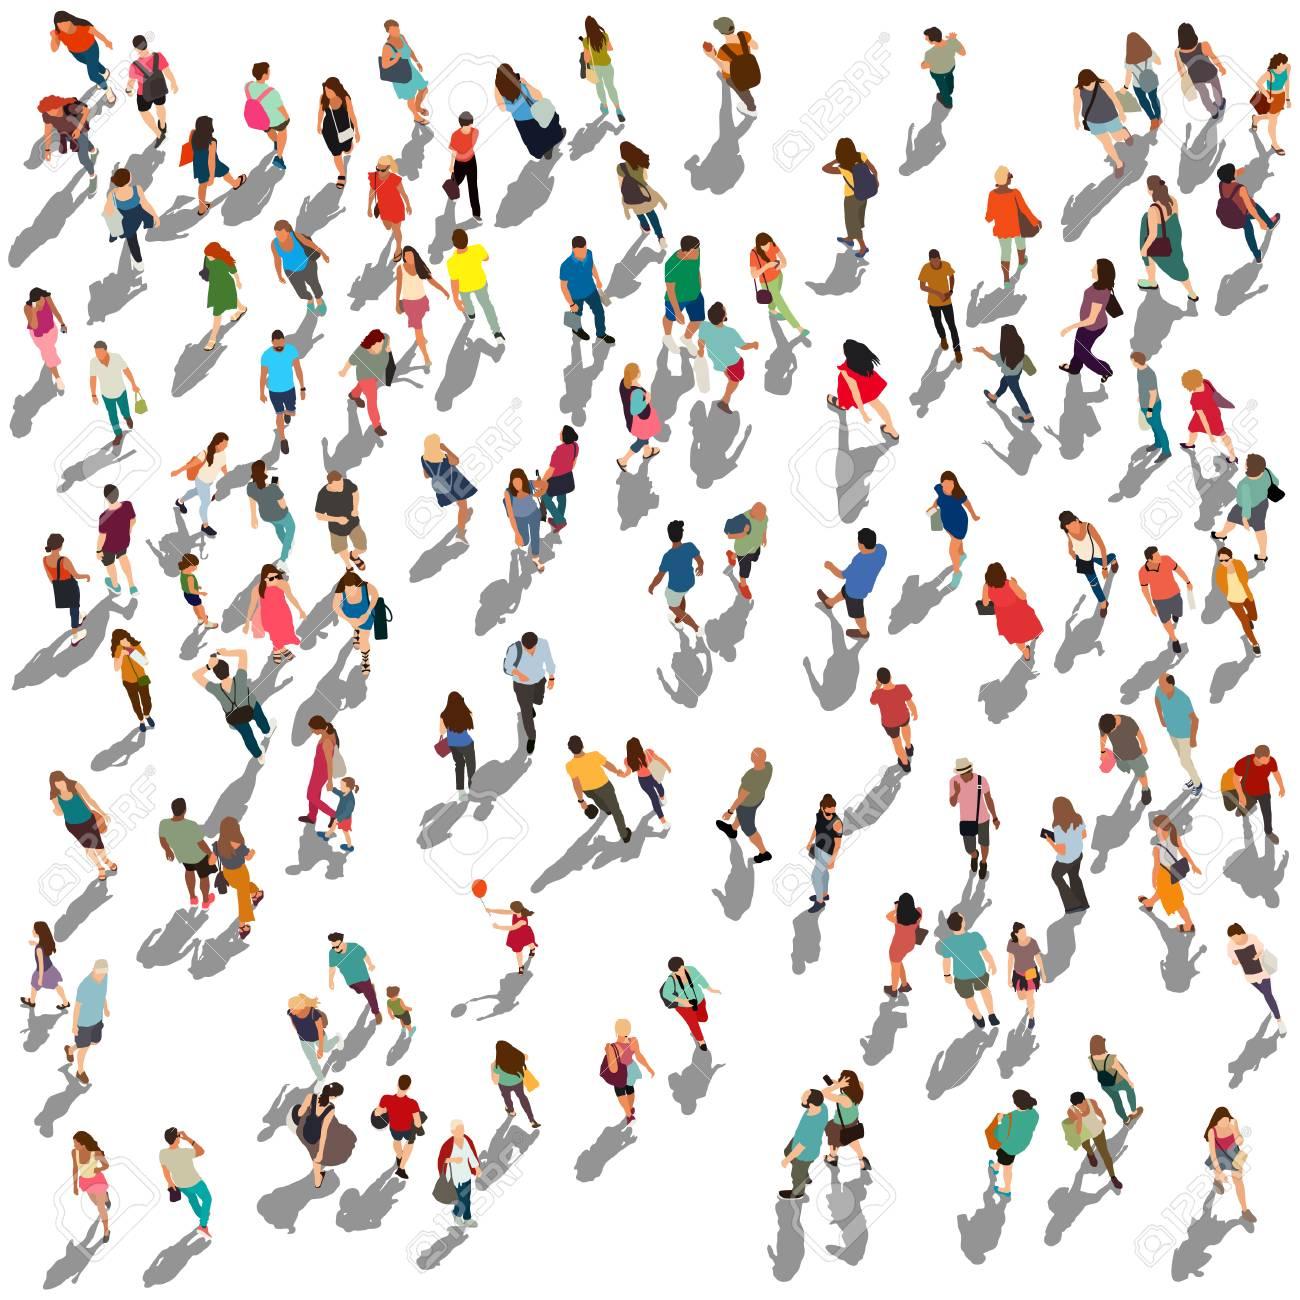 People crowd vector illustration - 107998236